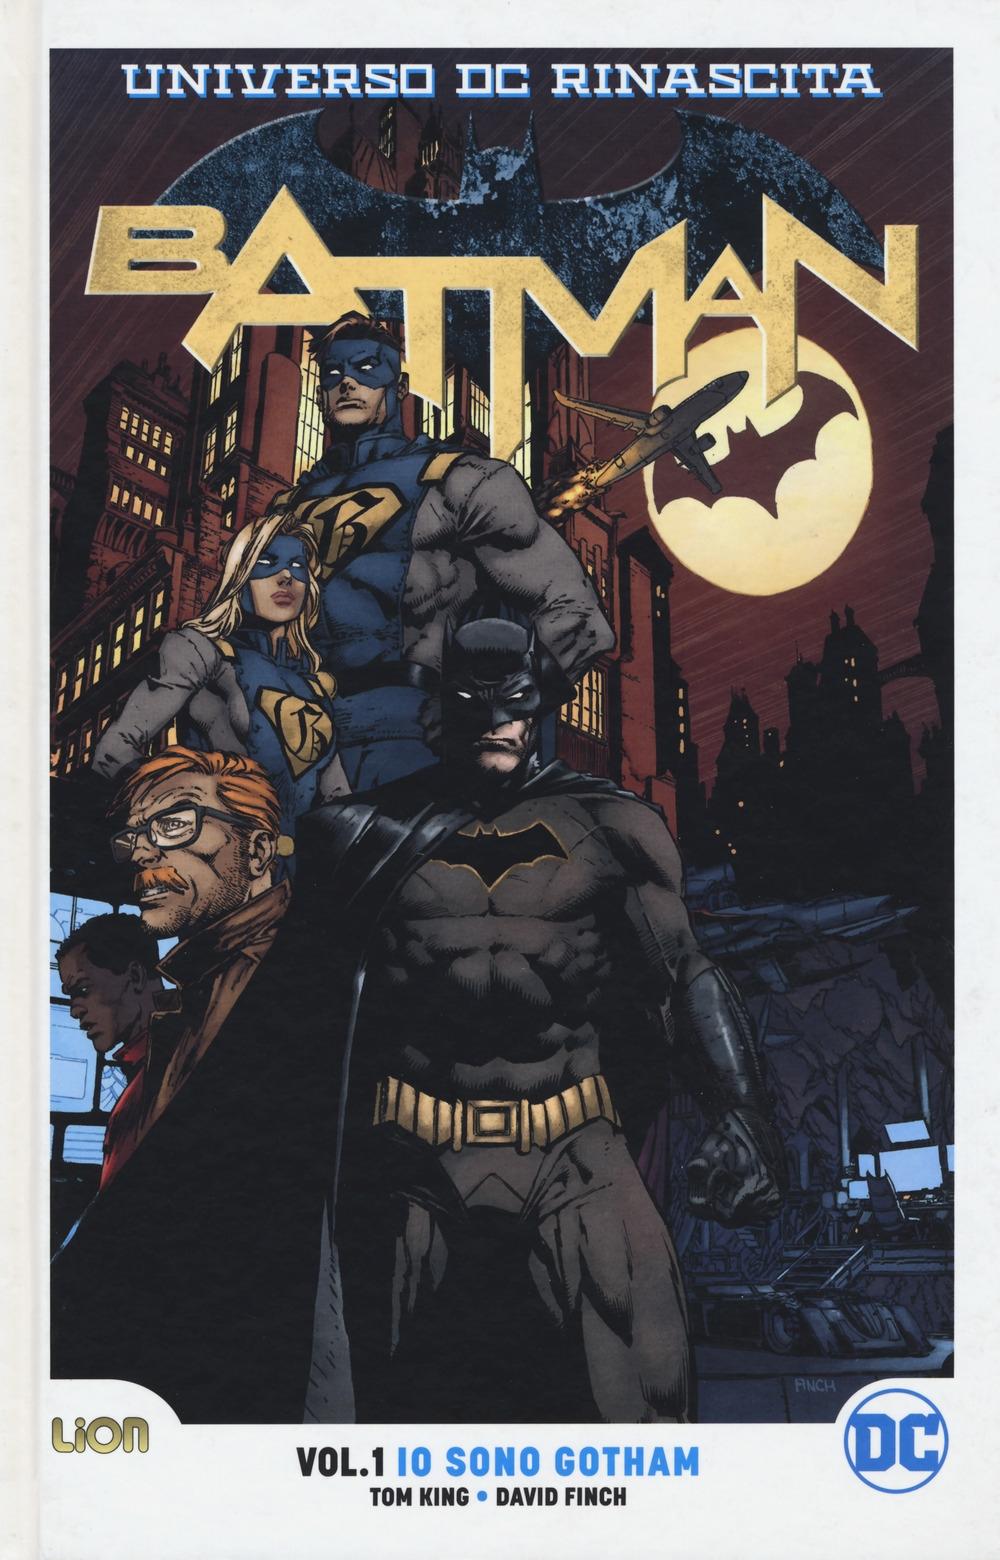 Rinascita. Batman. Vol. 1: Io sono Gotham